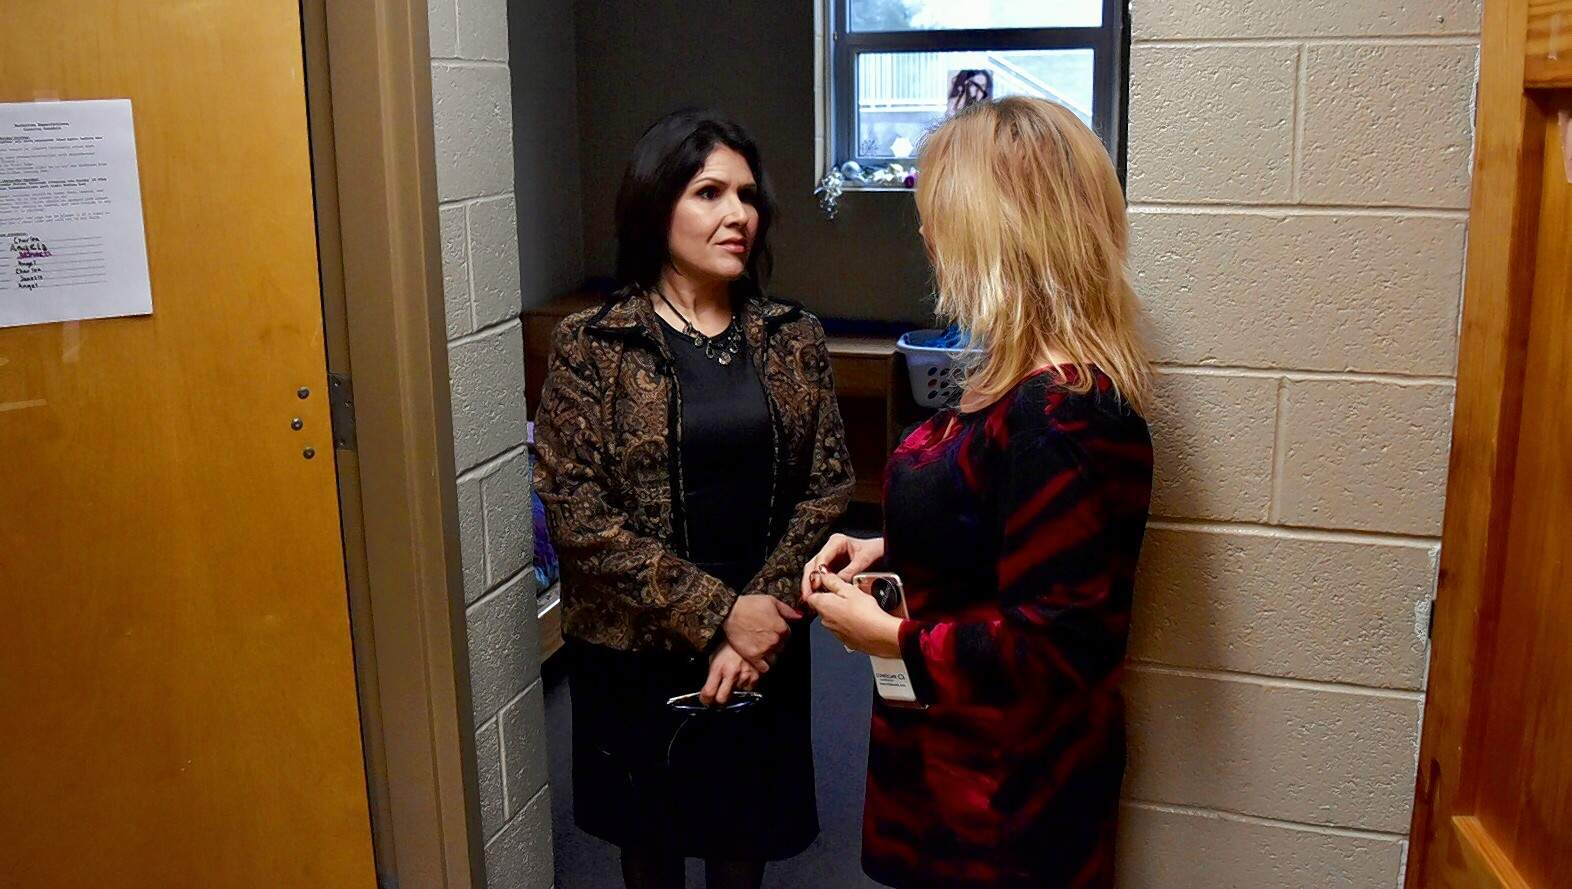 Illinois Lt. Gov. Evelyn Sanguinetti, left, talks with Gateway Foundation outreach coordinator Michelle Bertinetti.